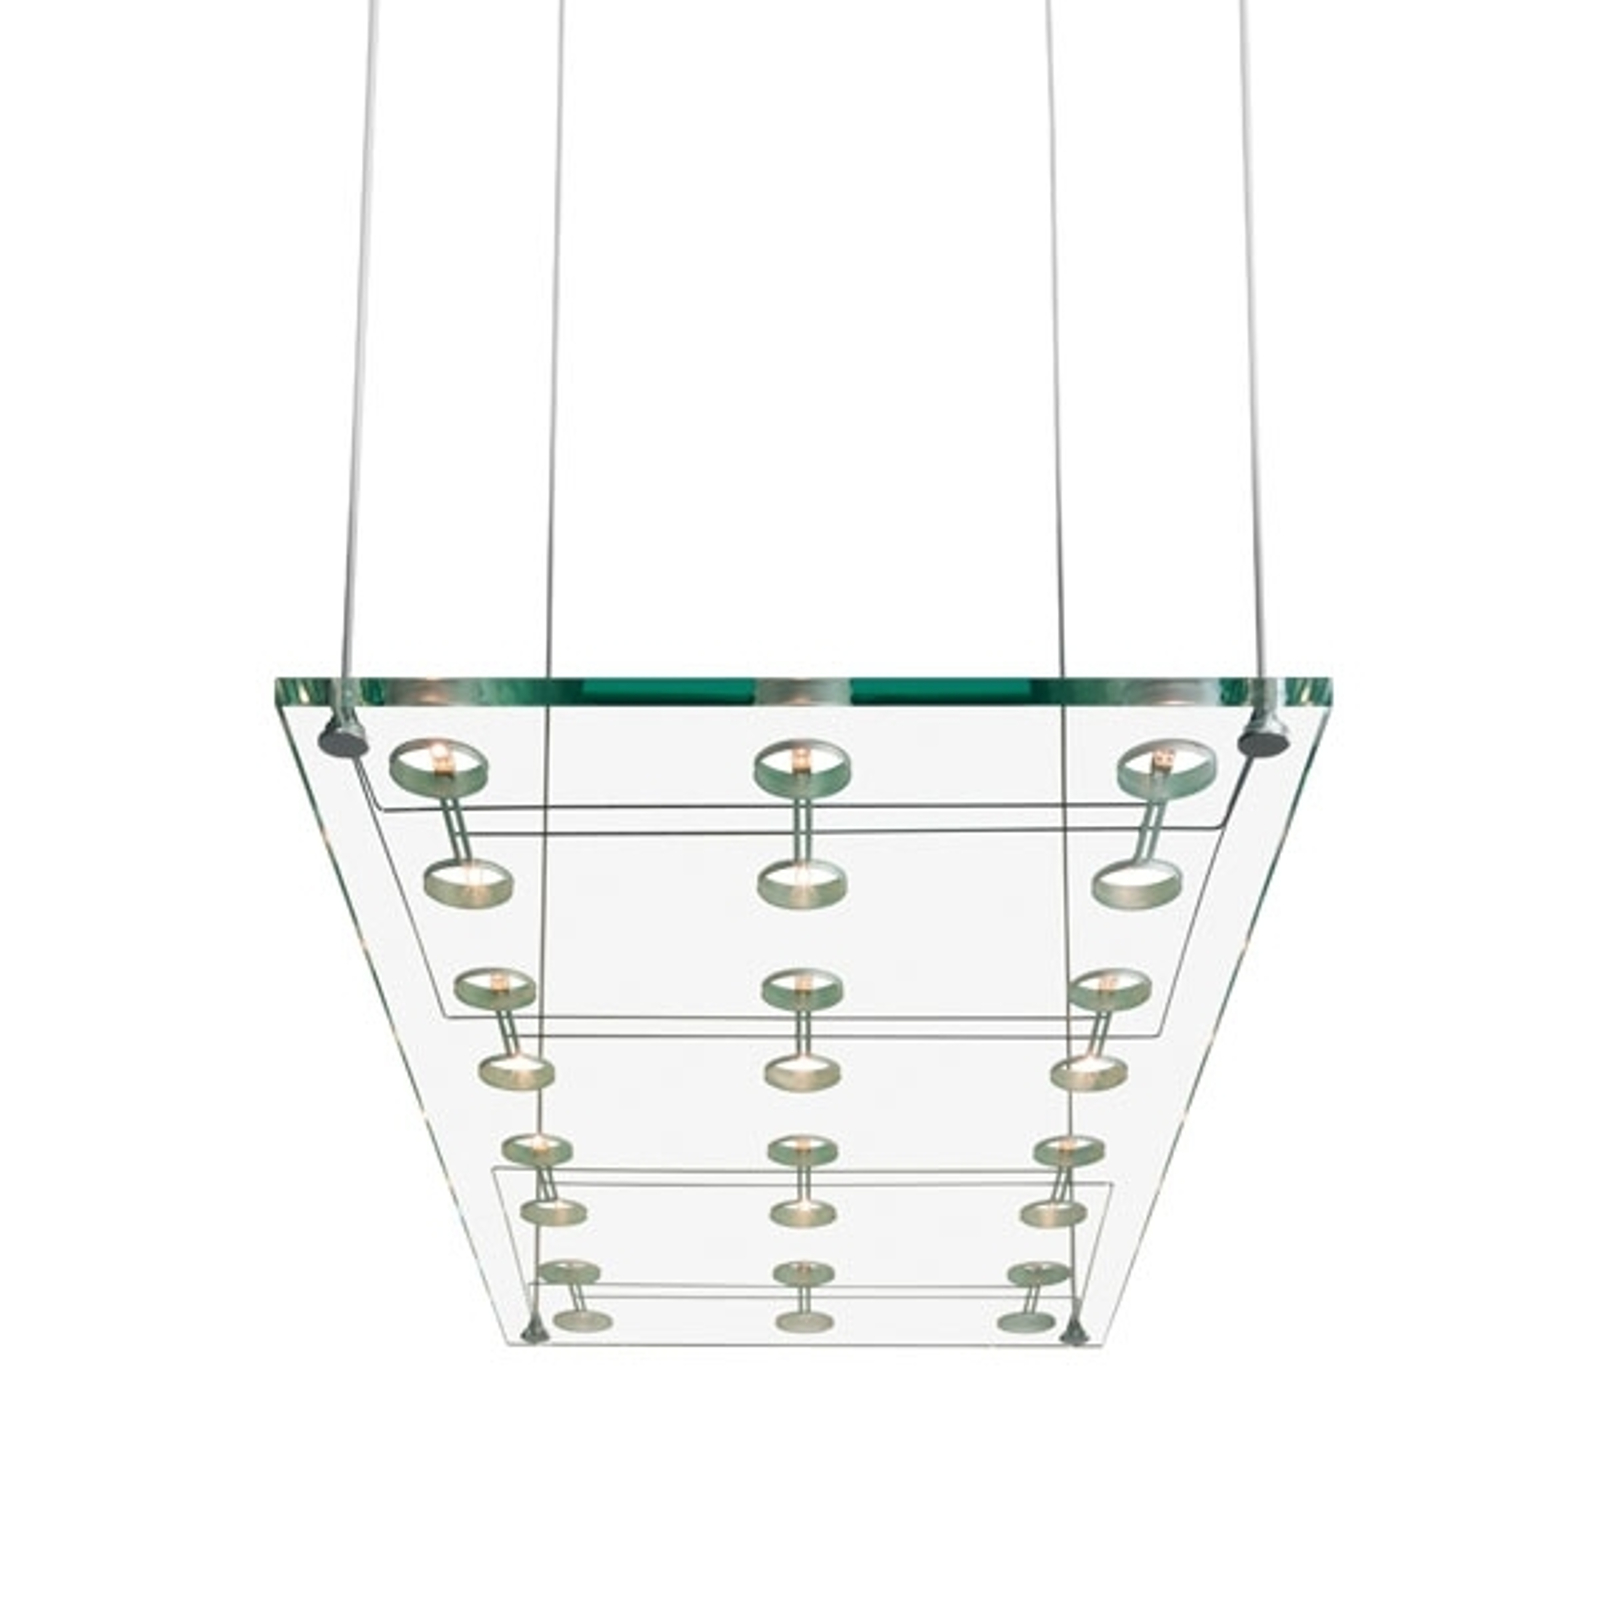 Eksklusiv SOSPESA designer-pendellampe i glass